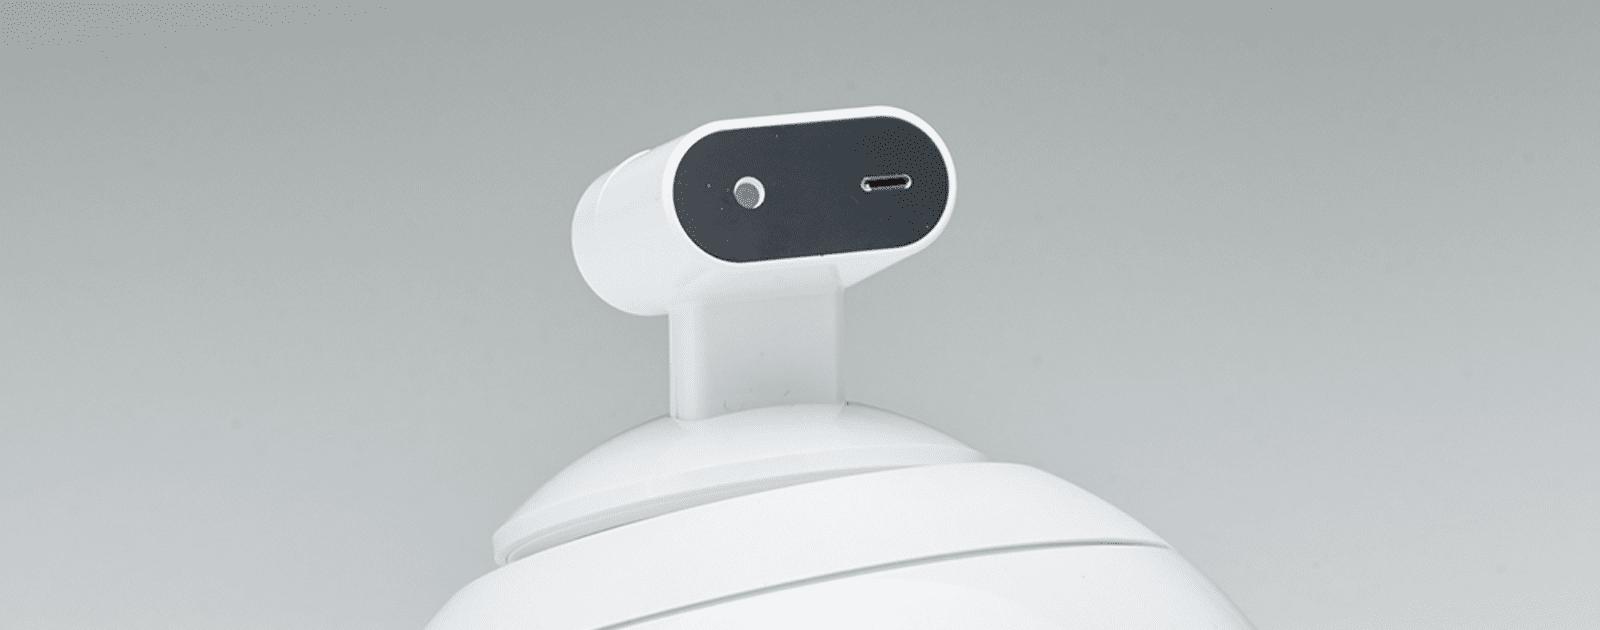 Analysis: Amazon's Plans for a Family Robot